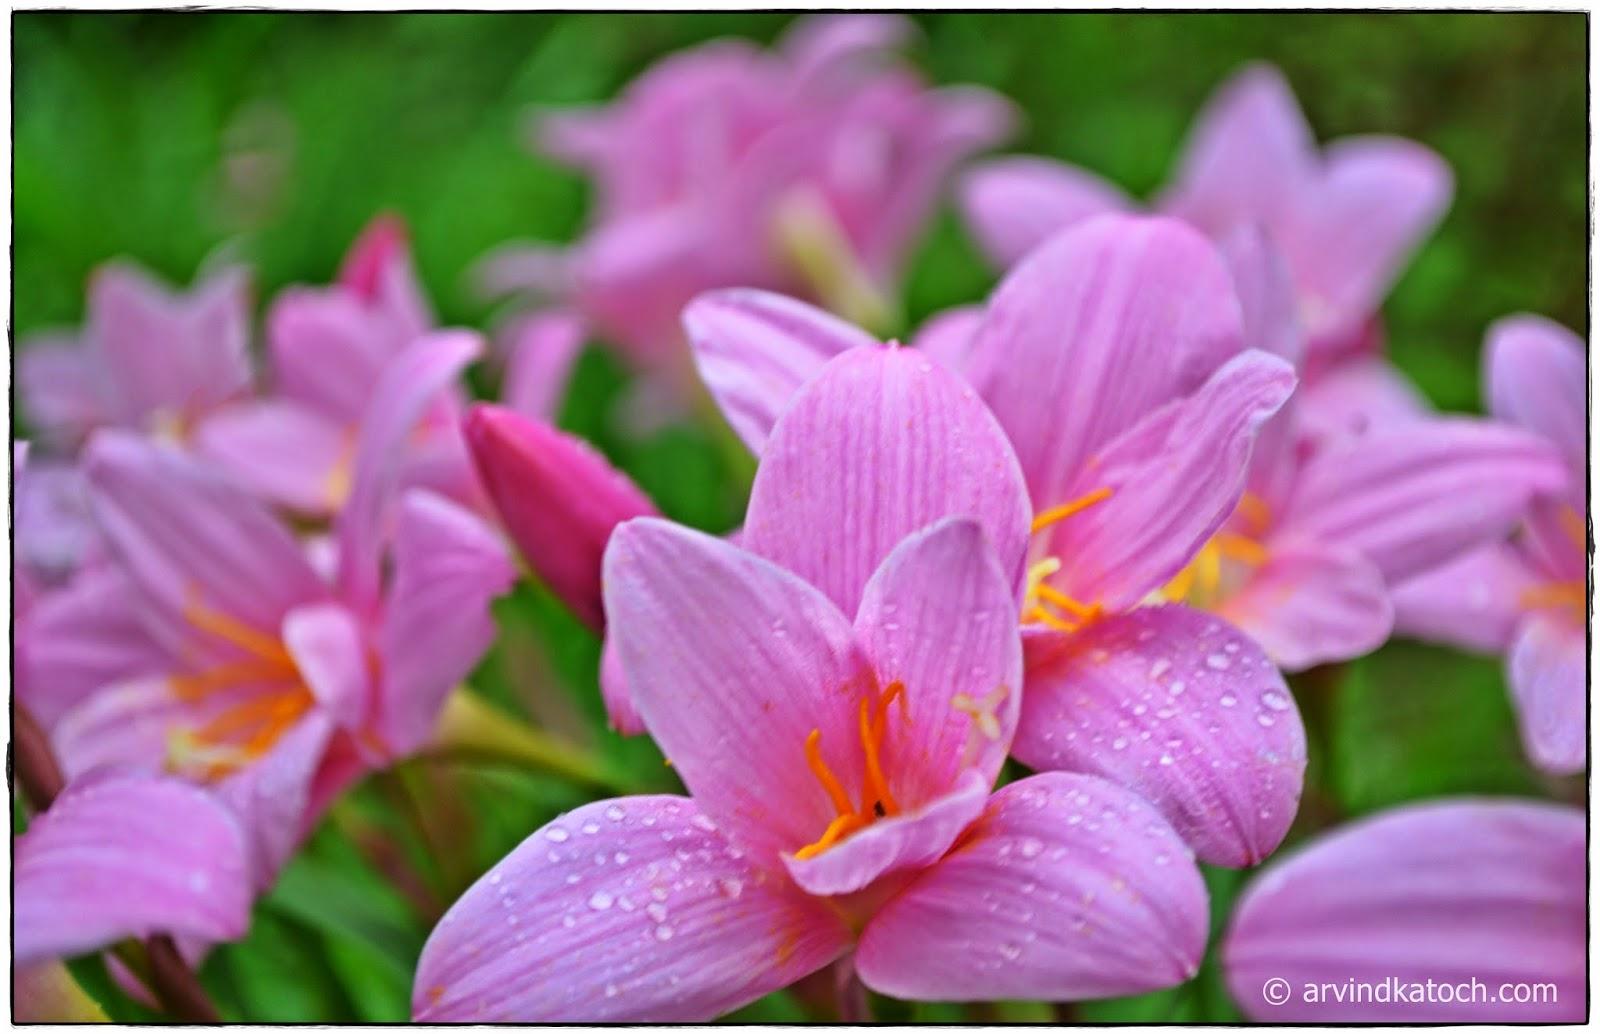 Pink Flowers, Grass, Flowers, Himachal Pradesh